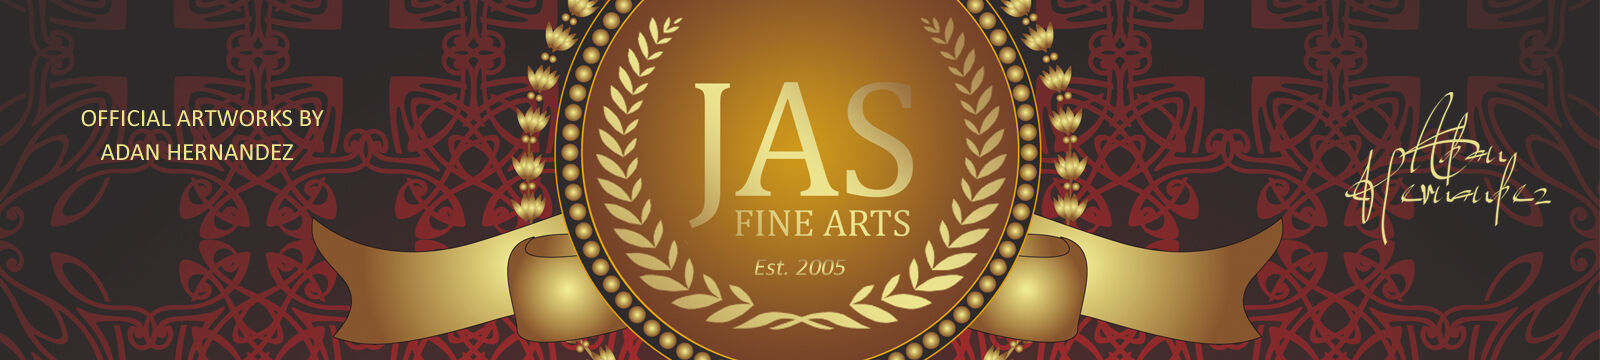 JAS FINE ARTS